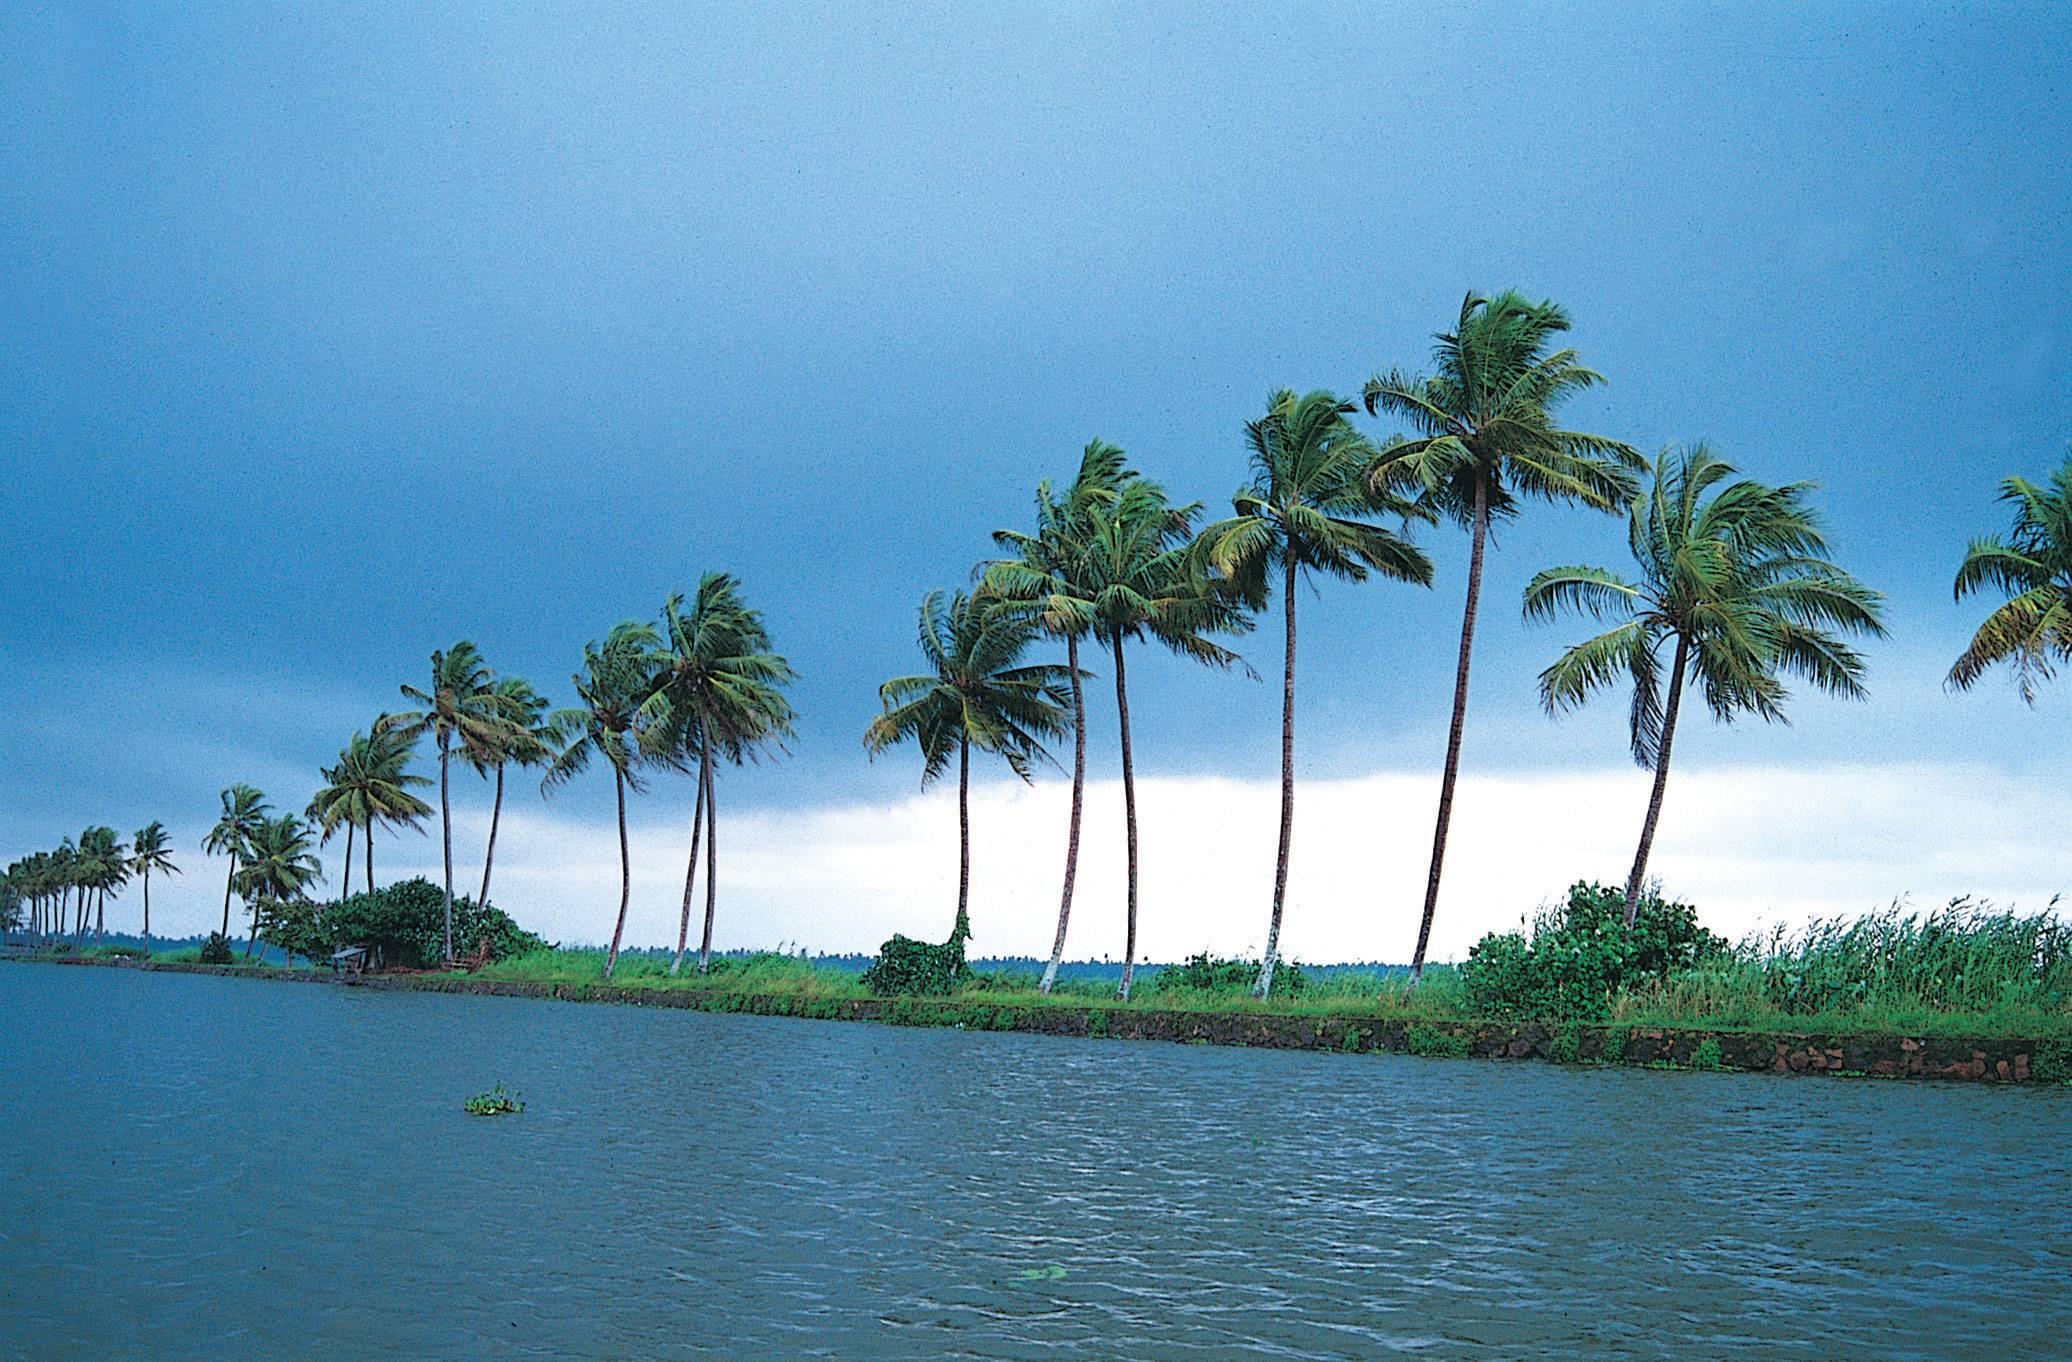 Kerala hd wallpapers hd widescreen wallpapers high definition